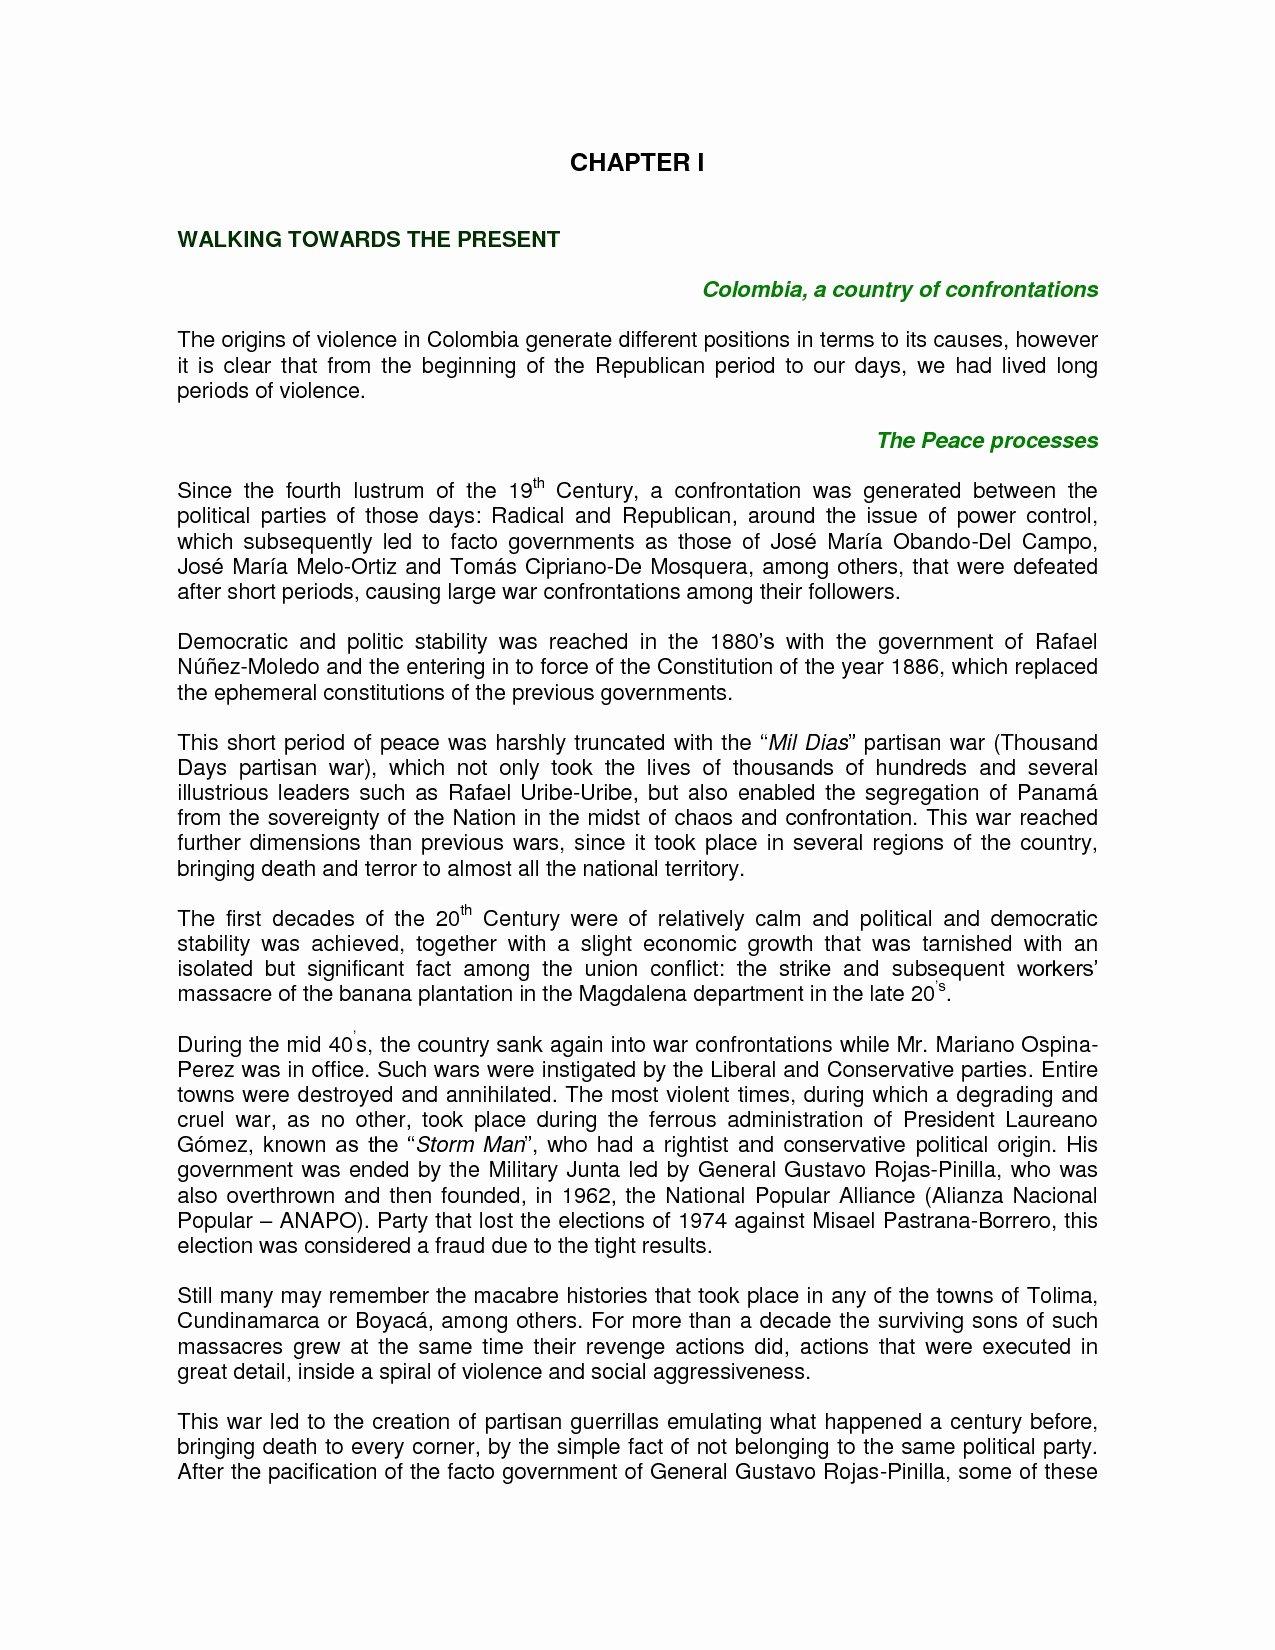 proposal letter democratic party